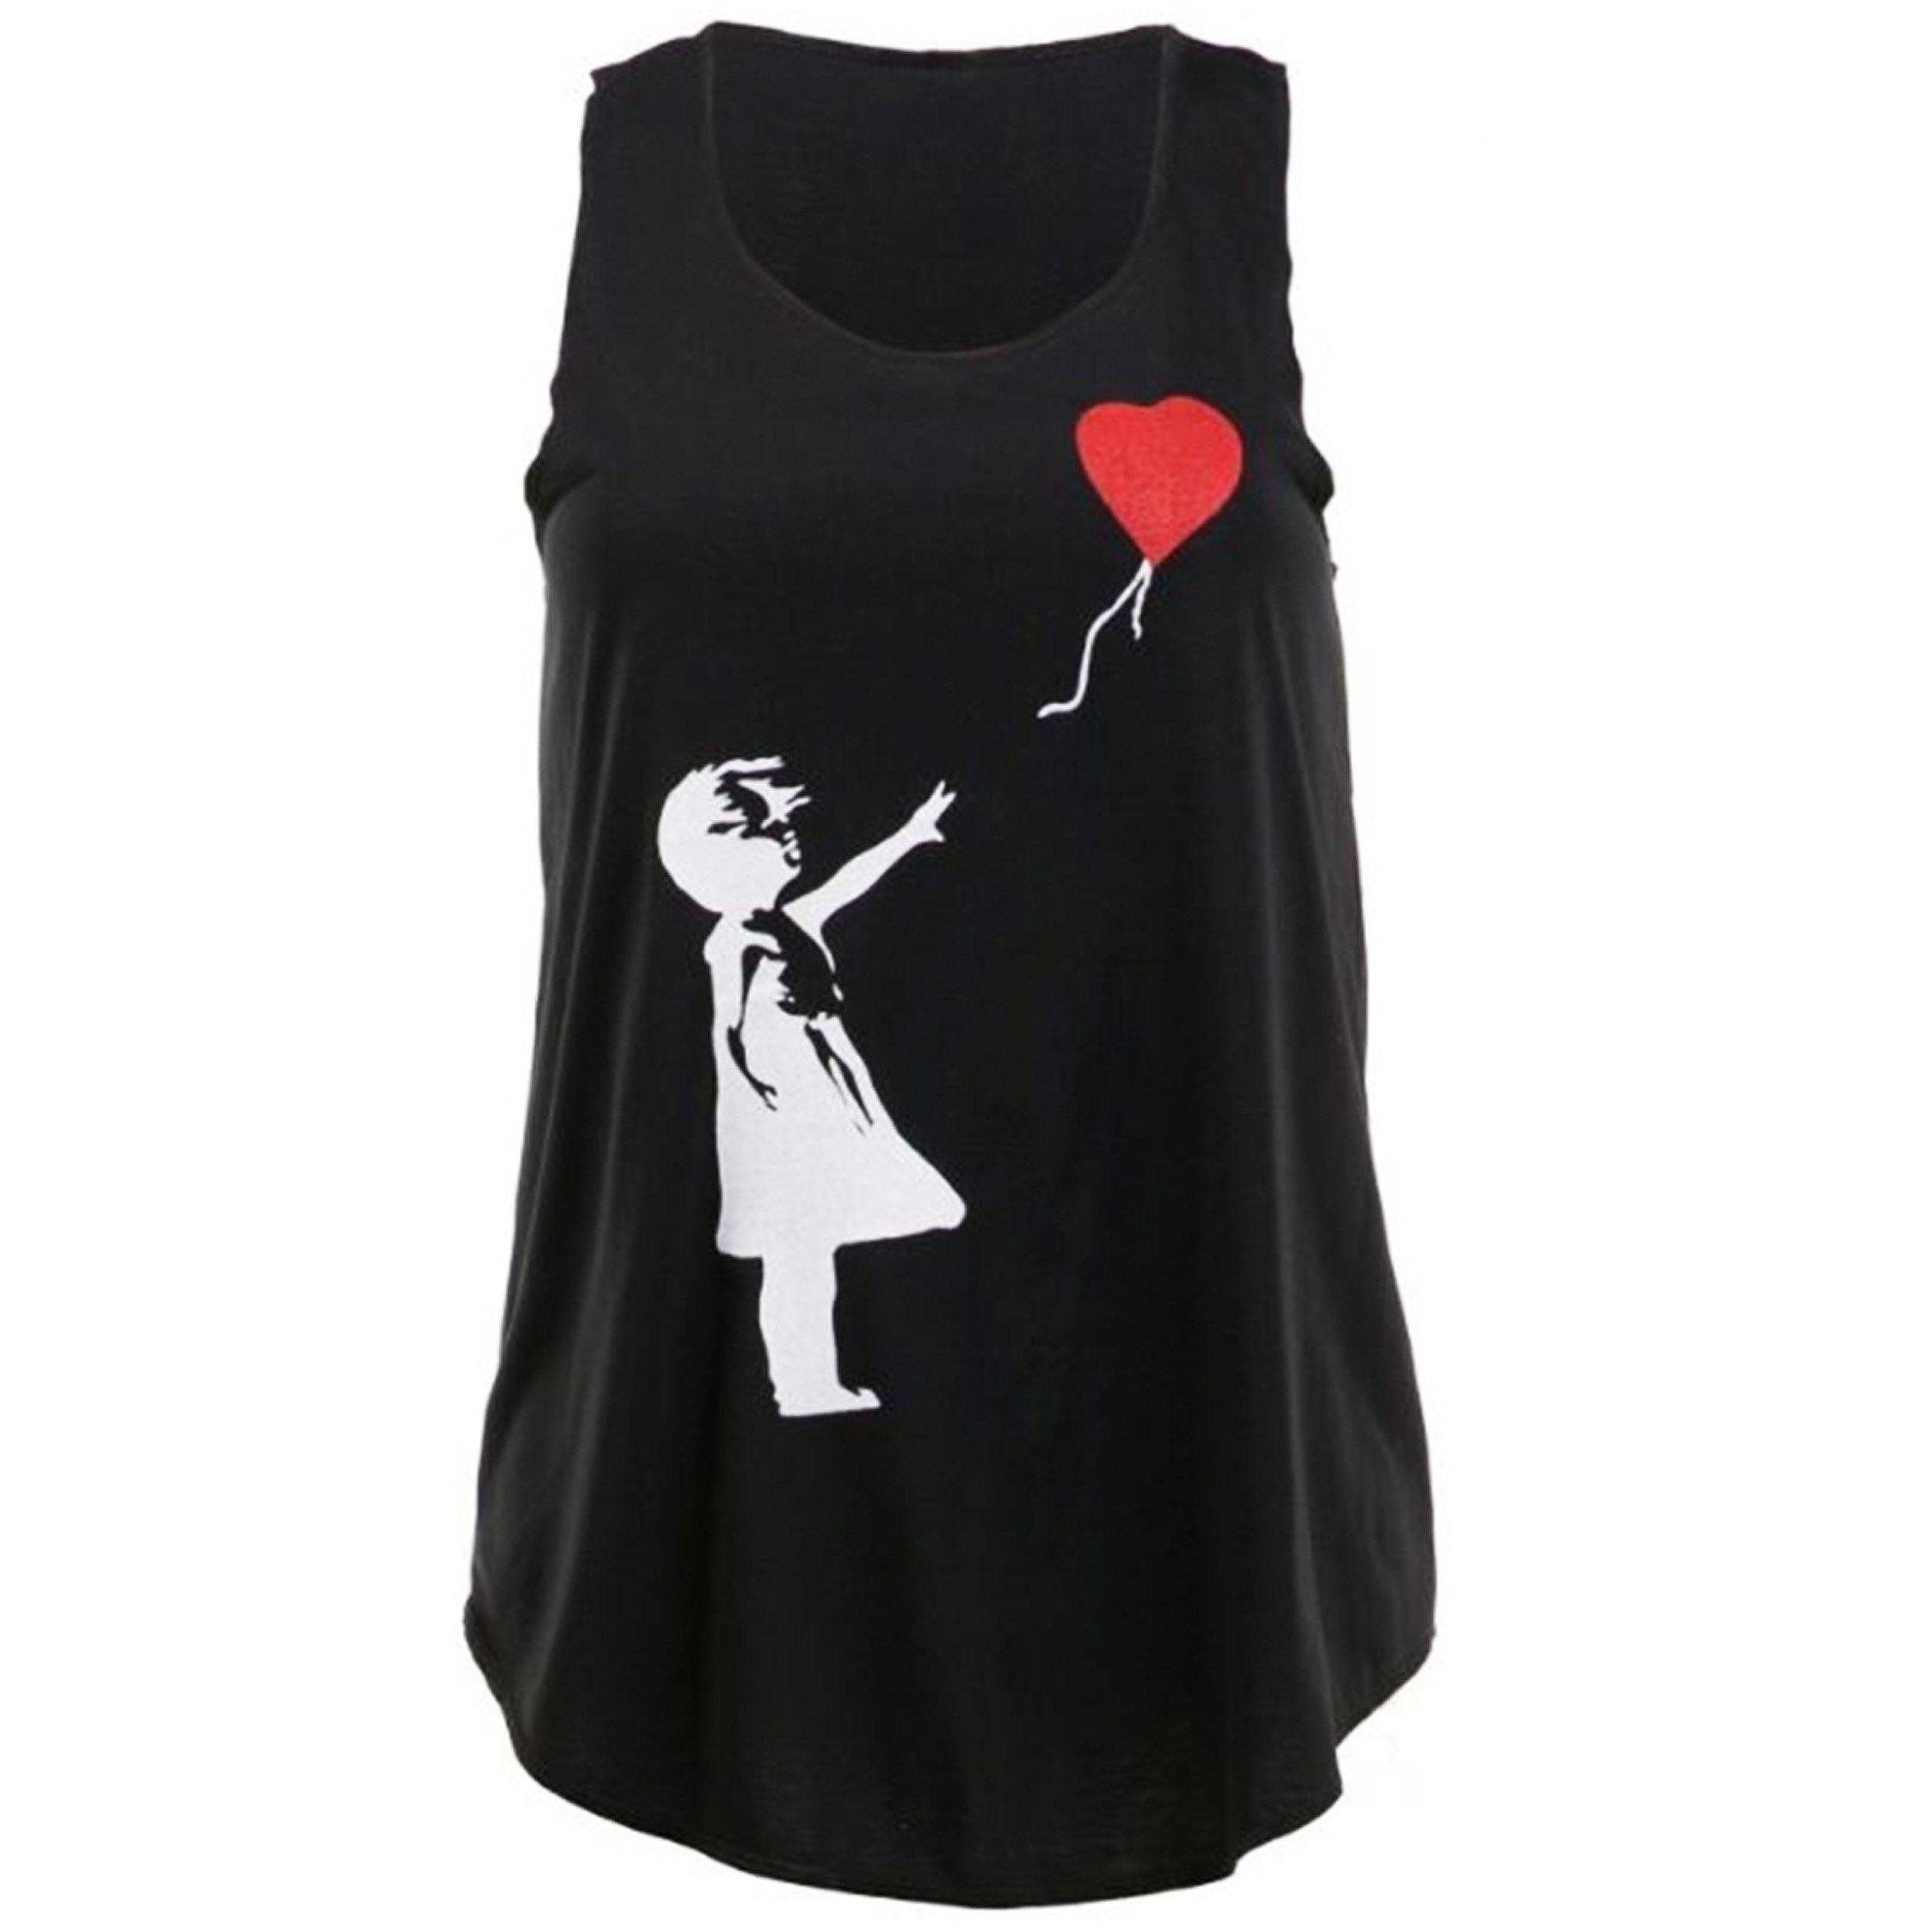 Banksy Girl With Heart Shaped Balloon Graffiti Cool Sweatshirt Jumper S-XXL